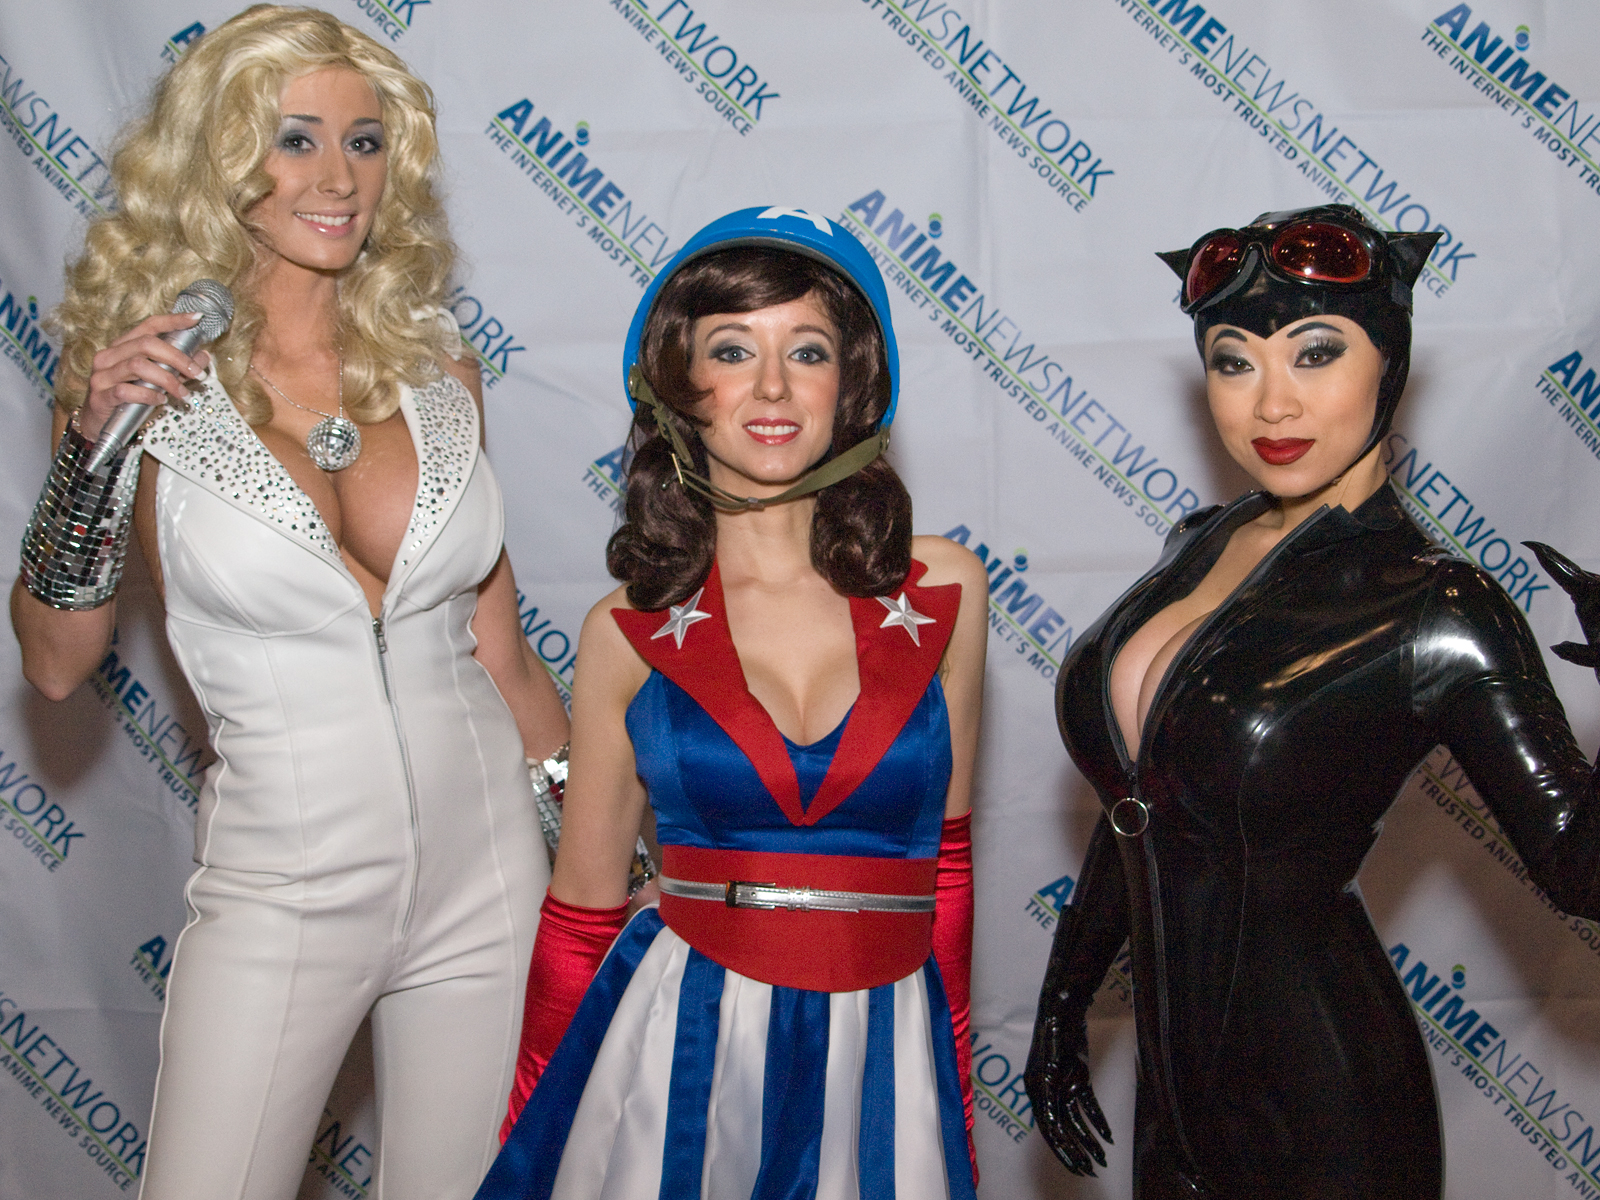 File:Cosplayers at NYCC 2011 (6254195541).jpg - Wikimedia ...